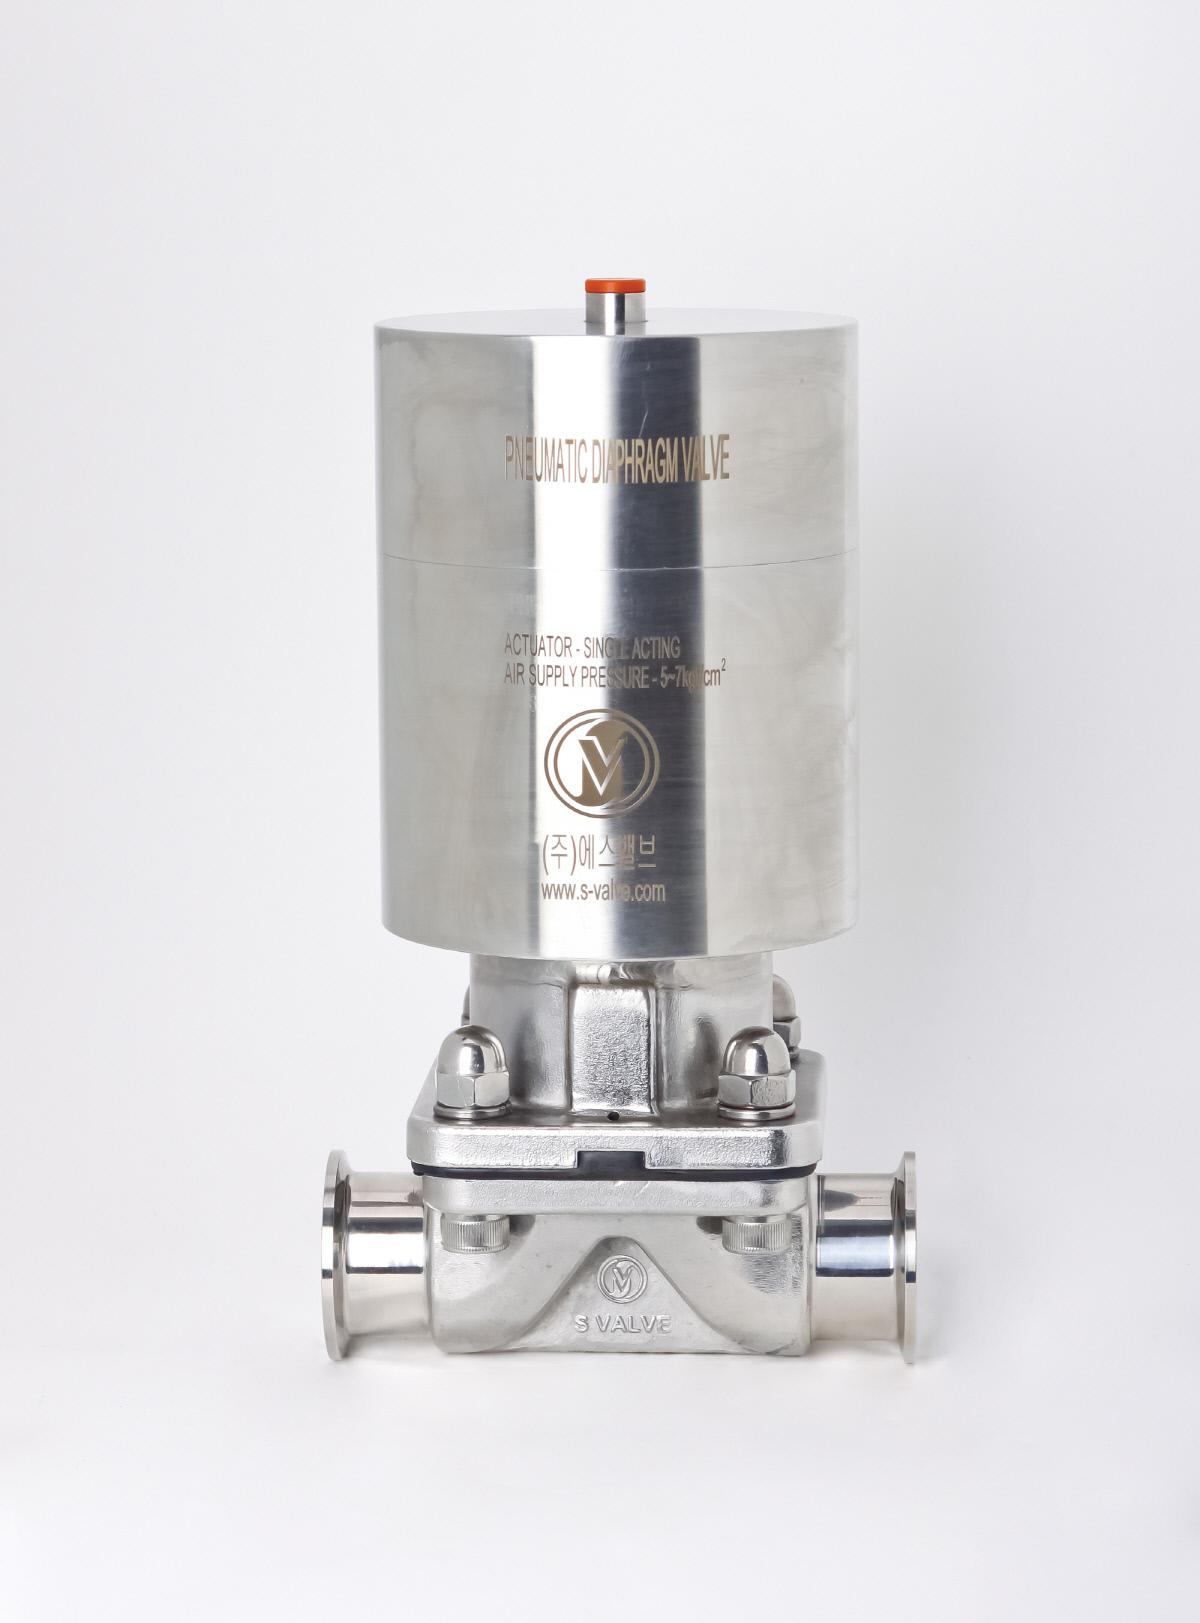 S-valve_0023.jpg